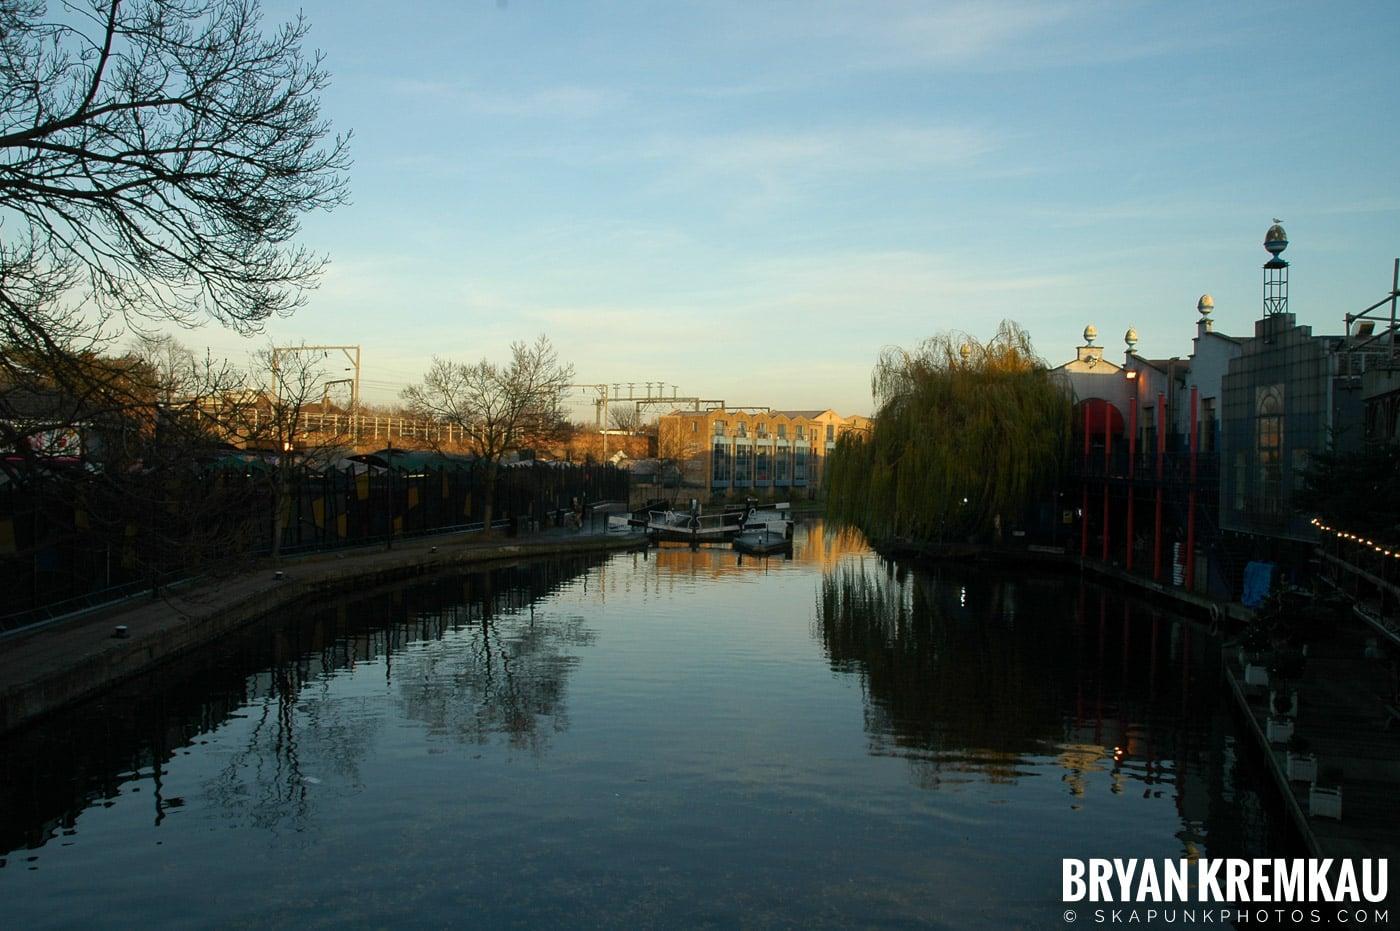 London, England - Day 4 - 12.19.05 (9)